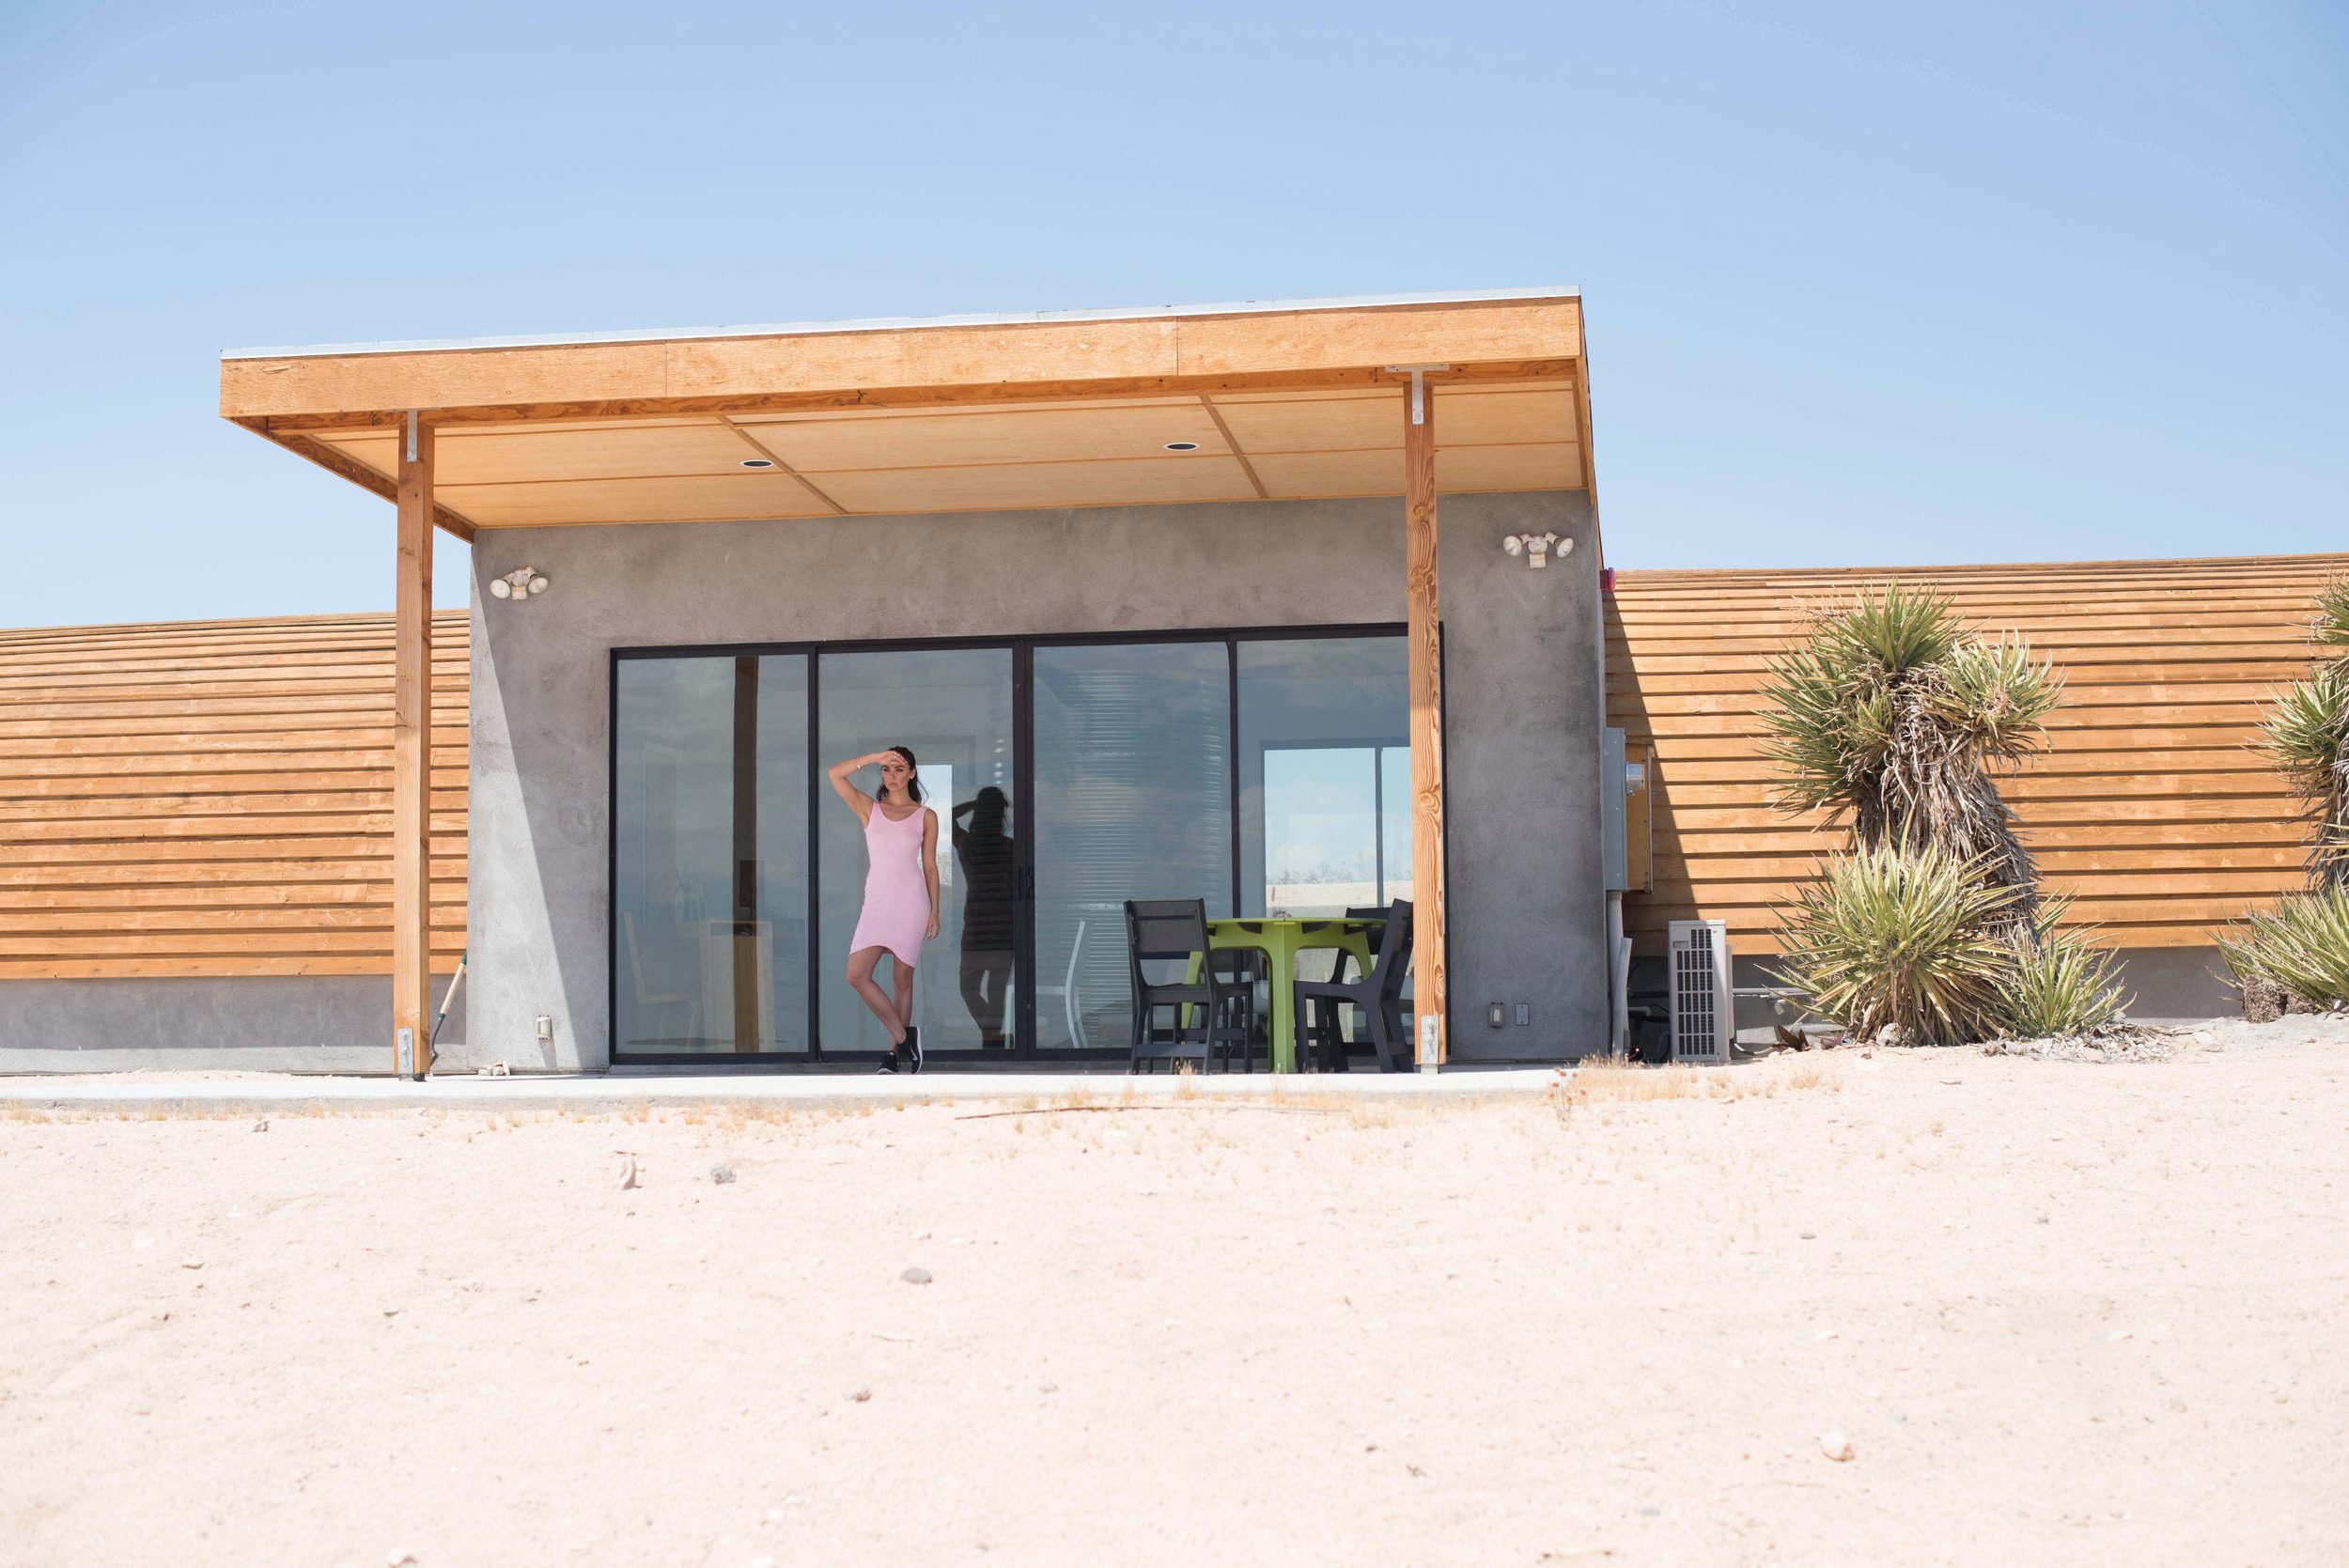 modern architecture in the desert